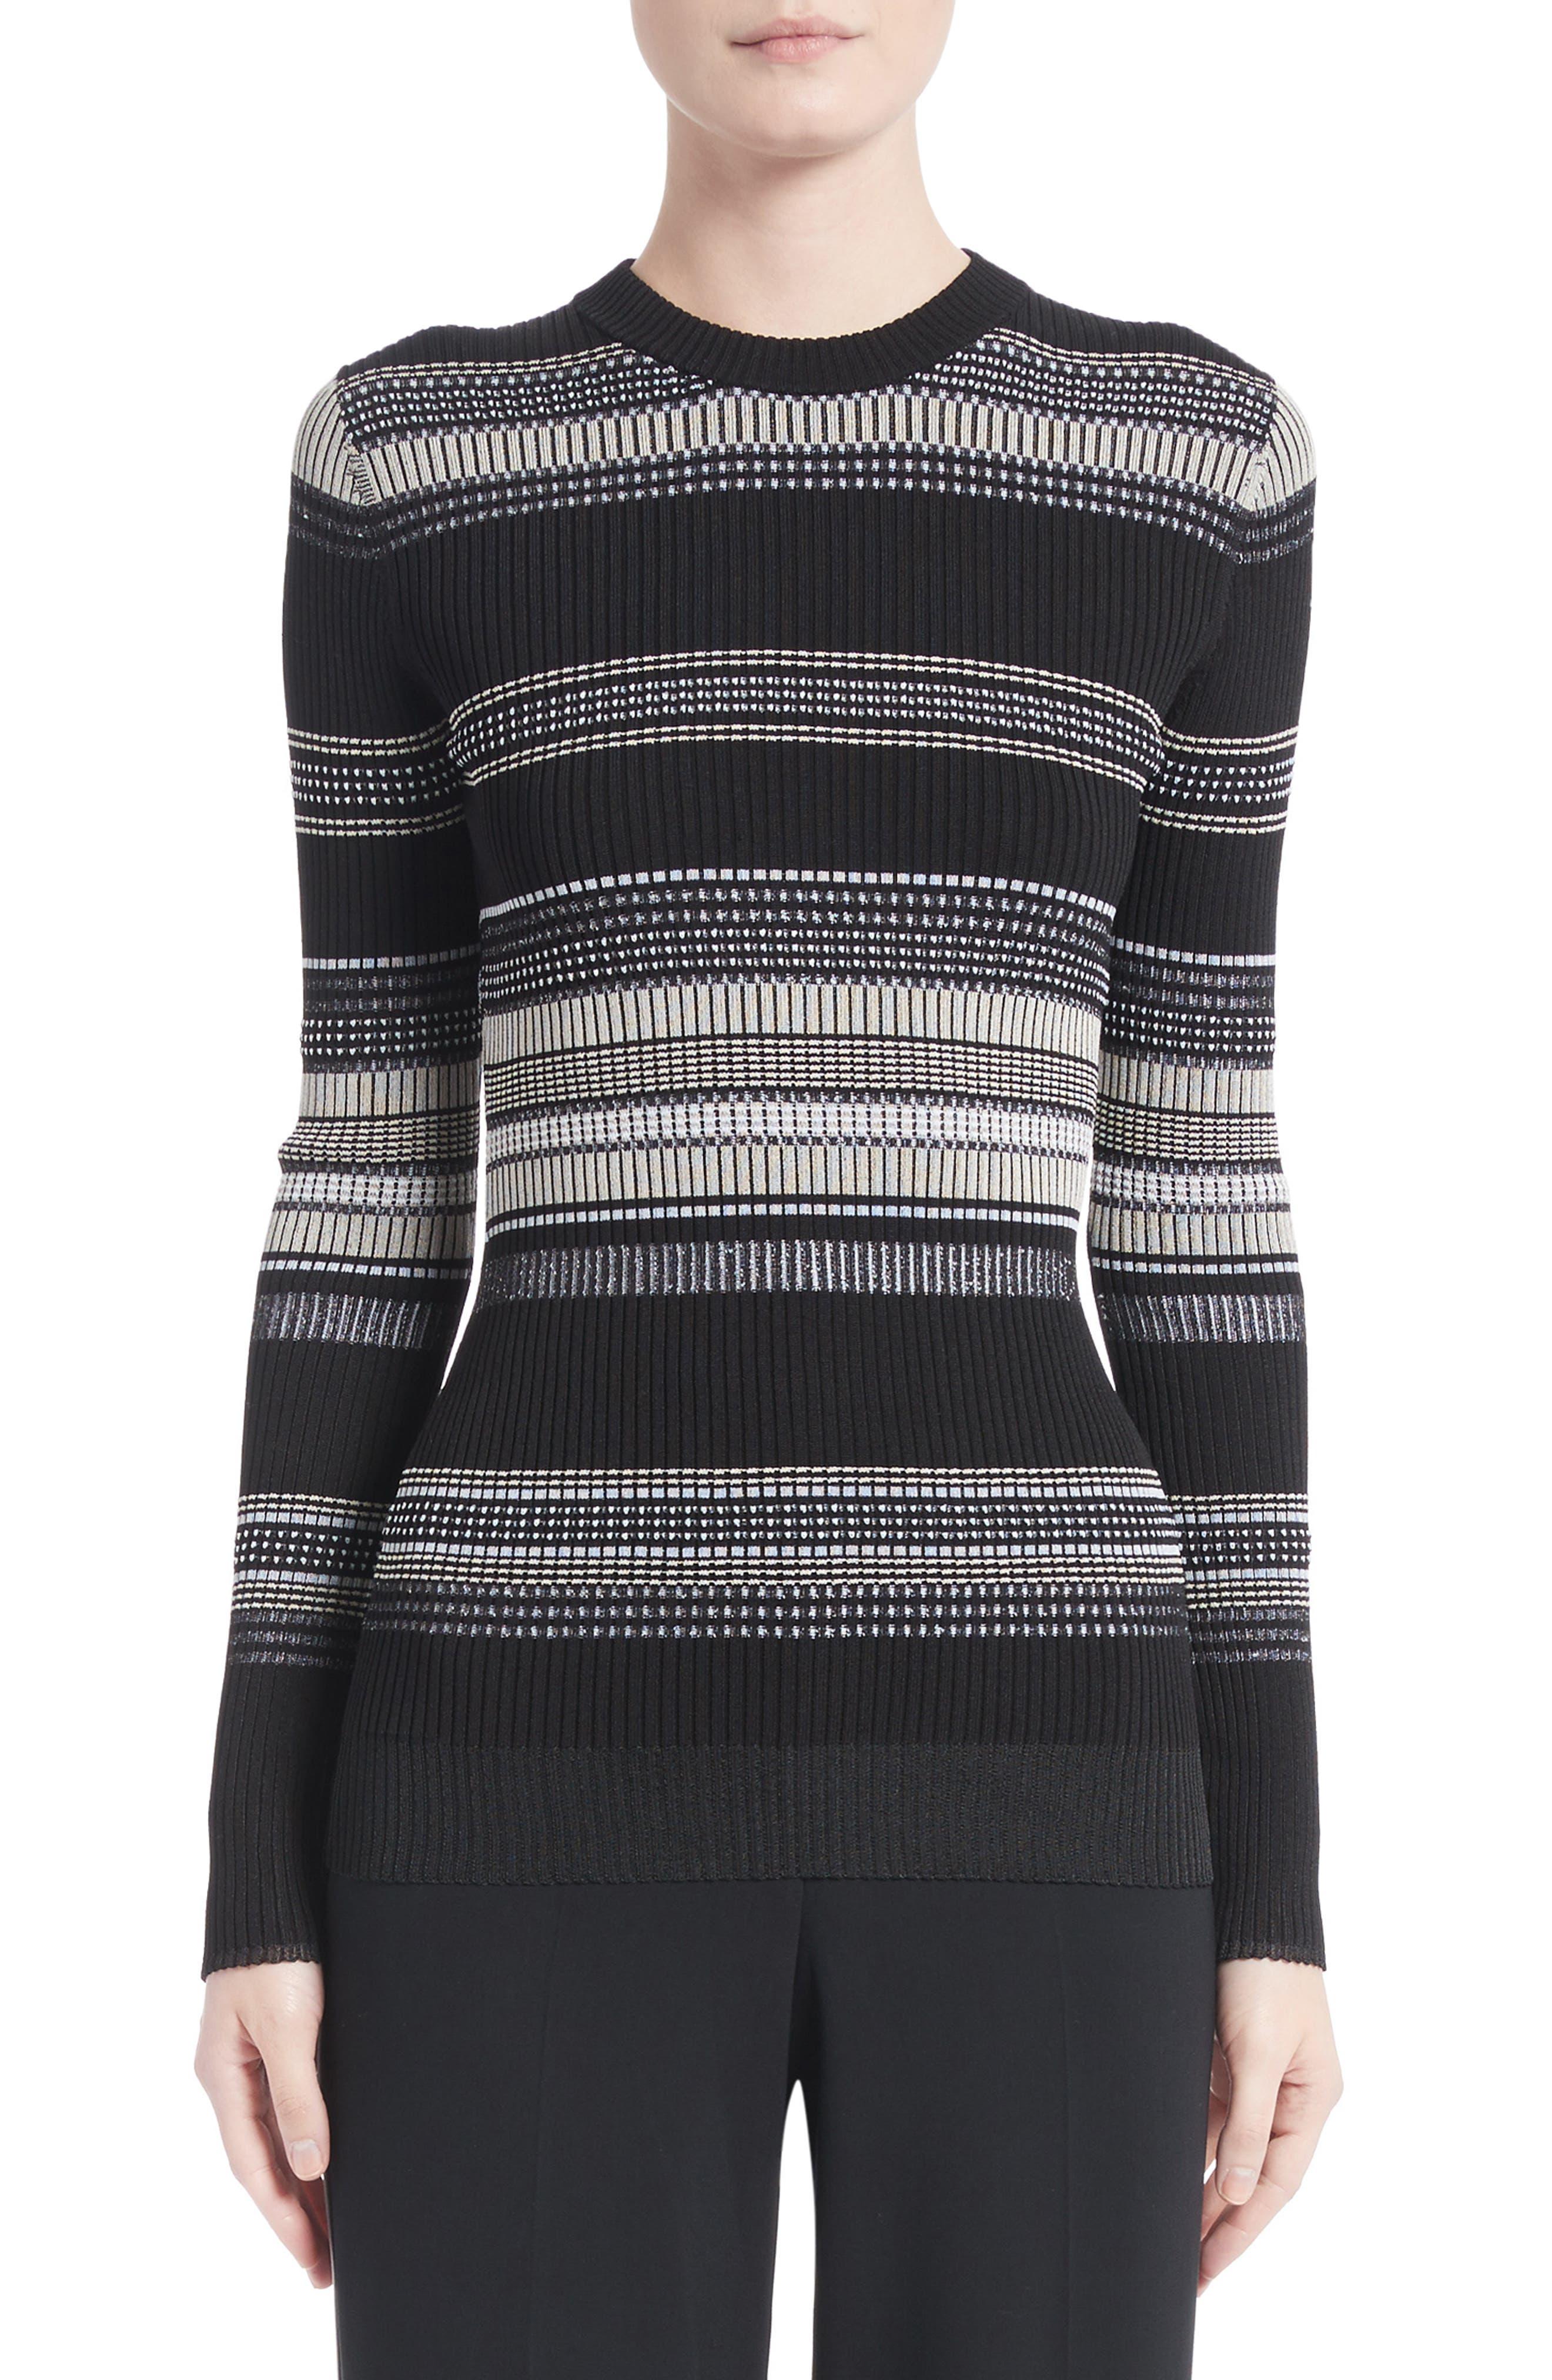 Alternate Image 1 Selected - Proenza Schouler Stripe Rib Knit Top